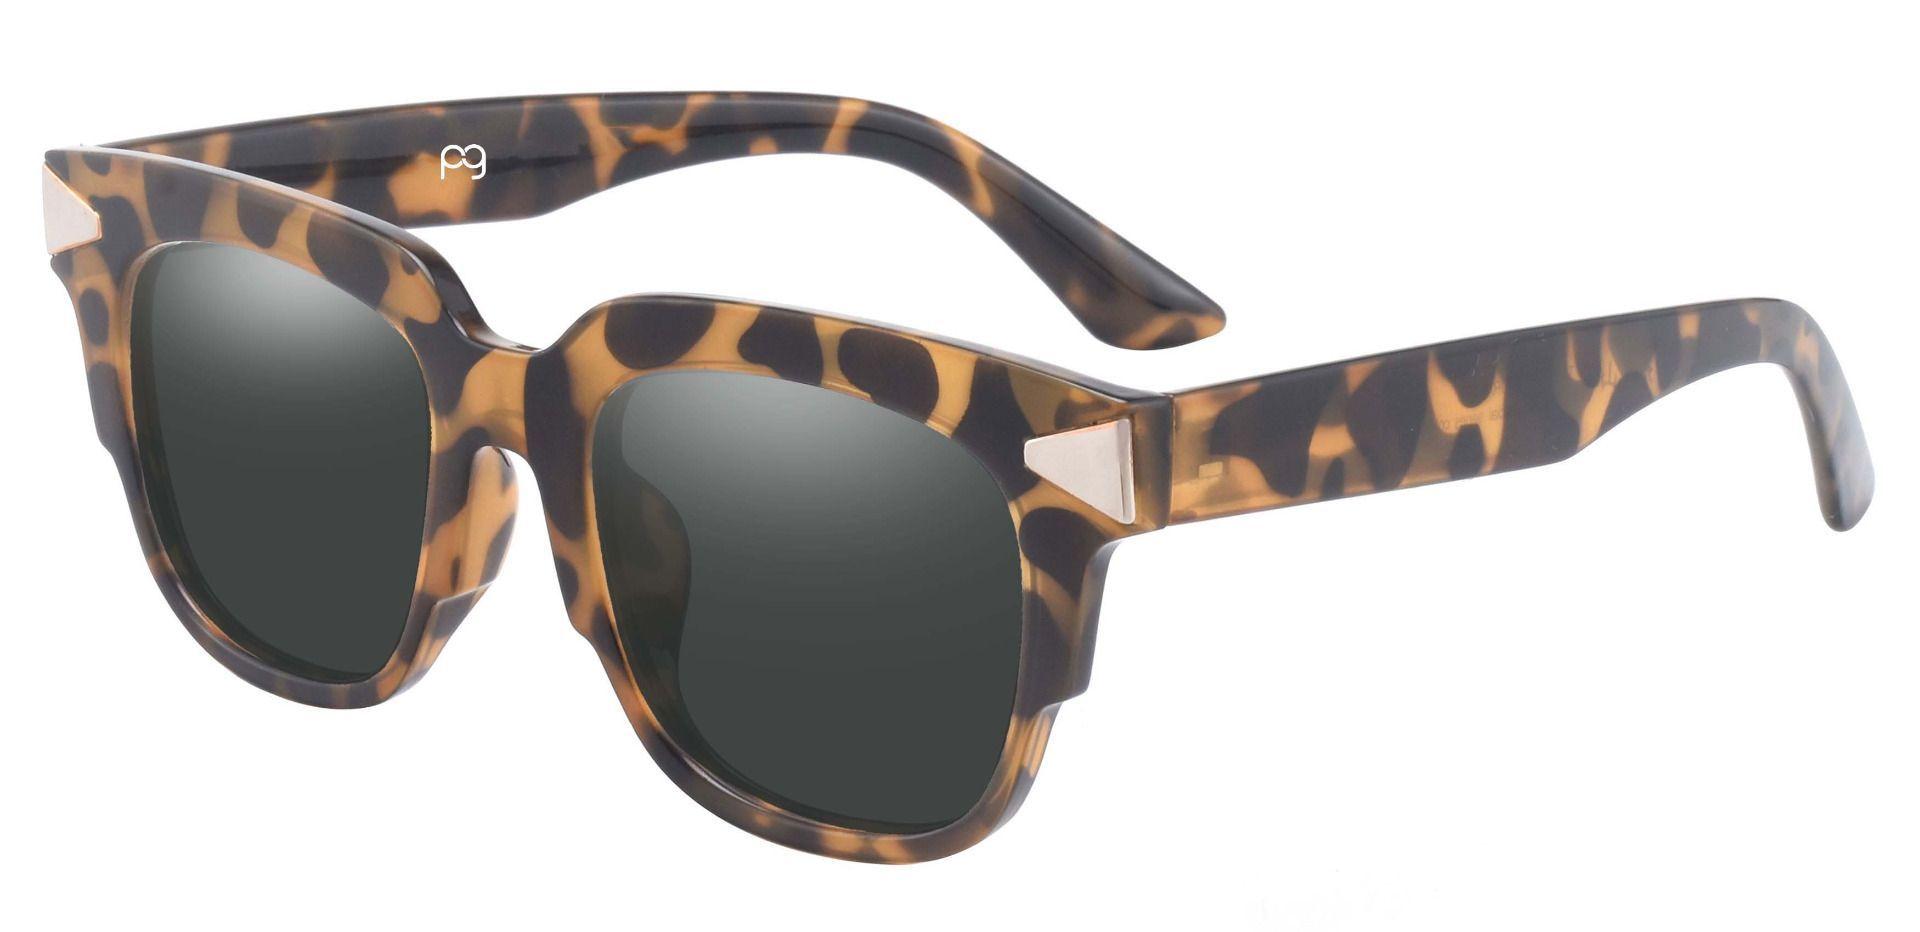 Ardent Square Prescription Sunglasses - Tortoise Frame With Gray Lenses